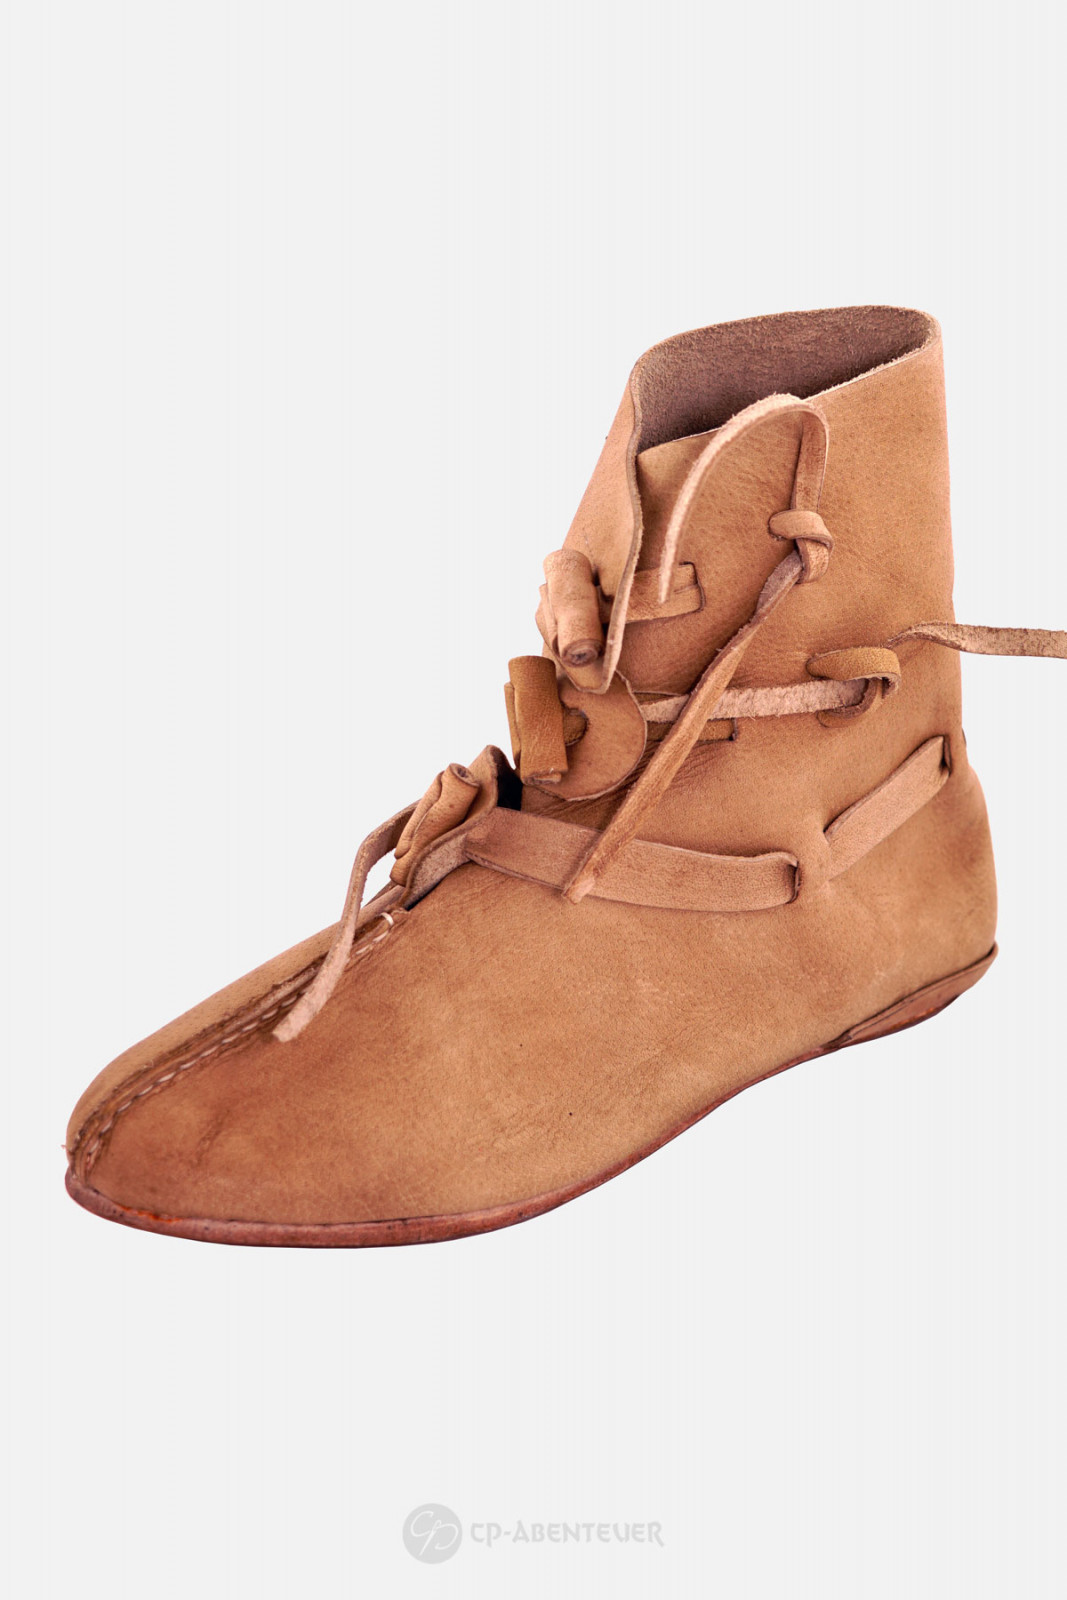 Caspar - Mittelalter Schuhe